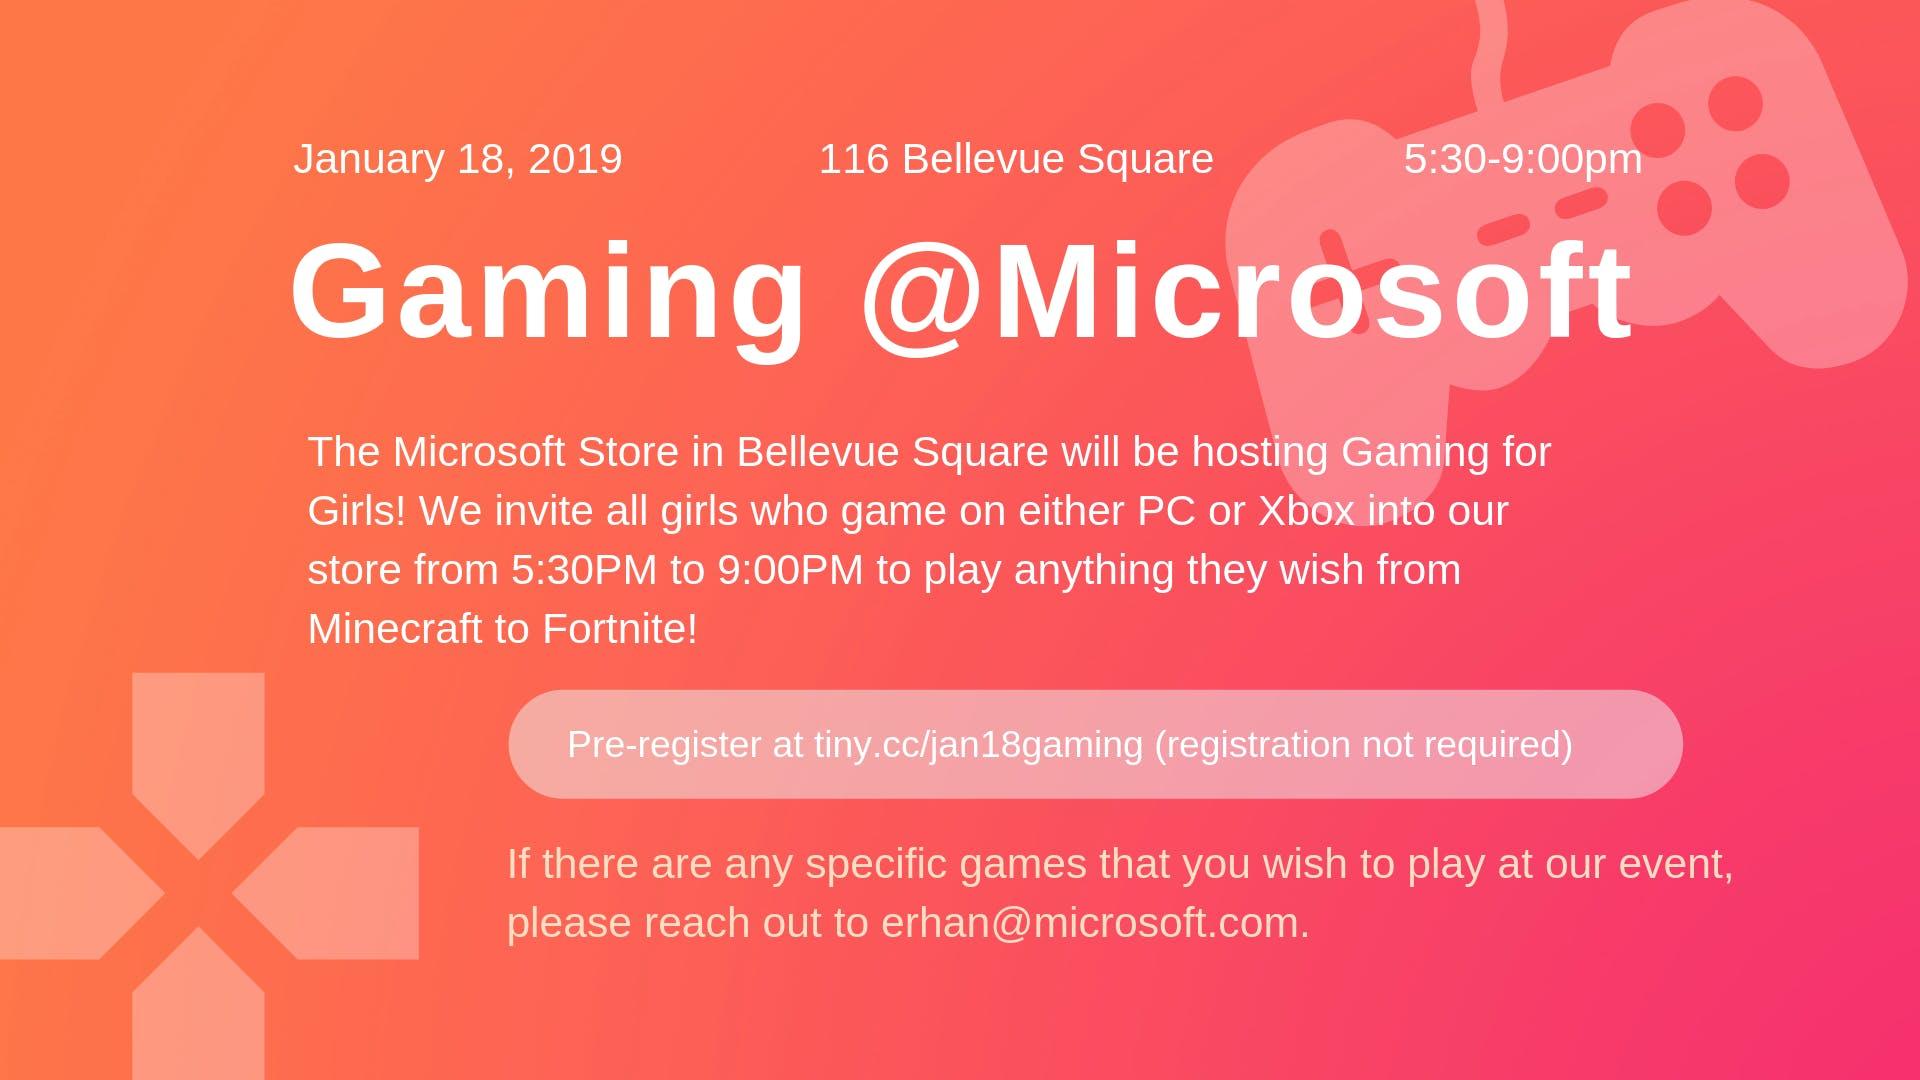 Gaming for Girls at Microsoft